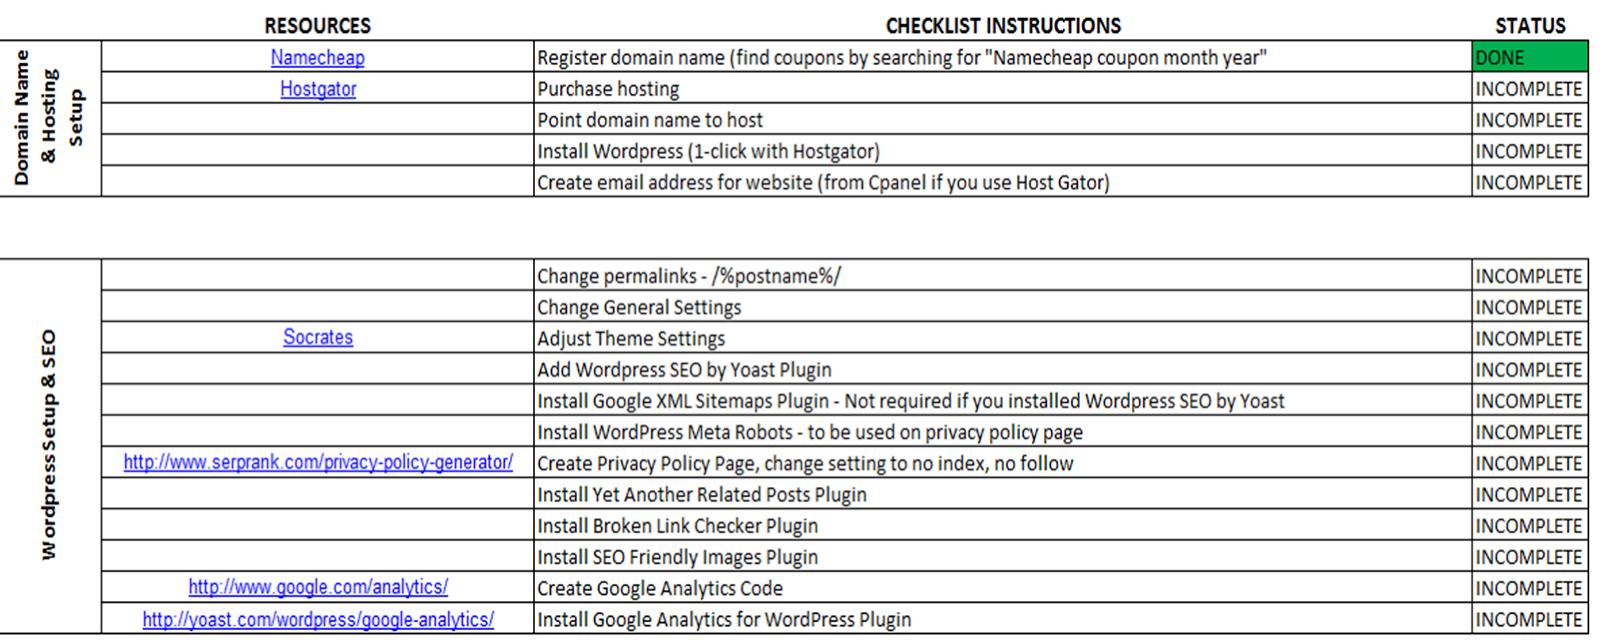 Excel Spreadsheets Help September 2013